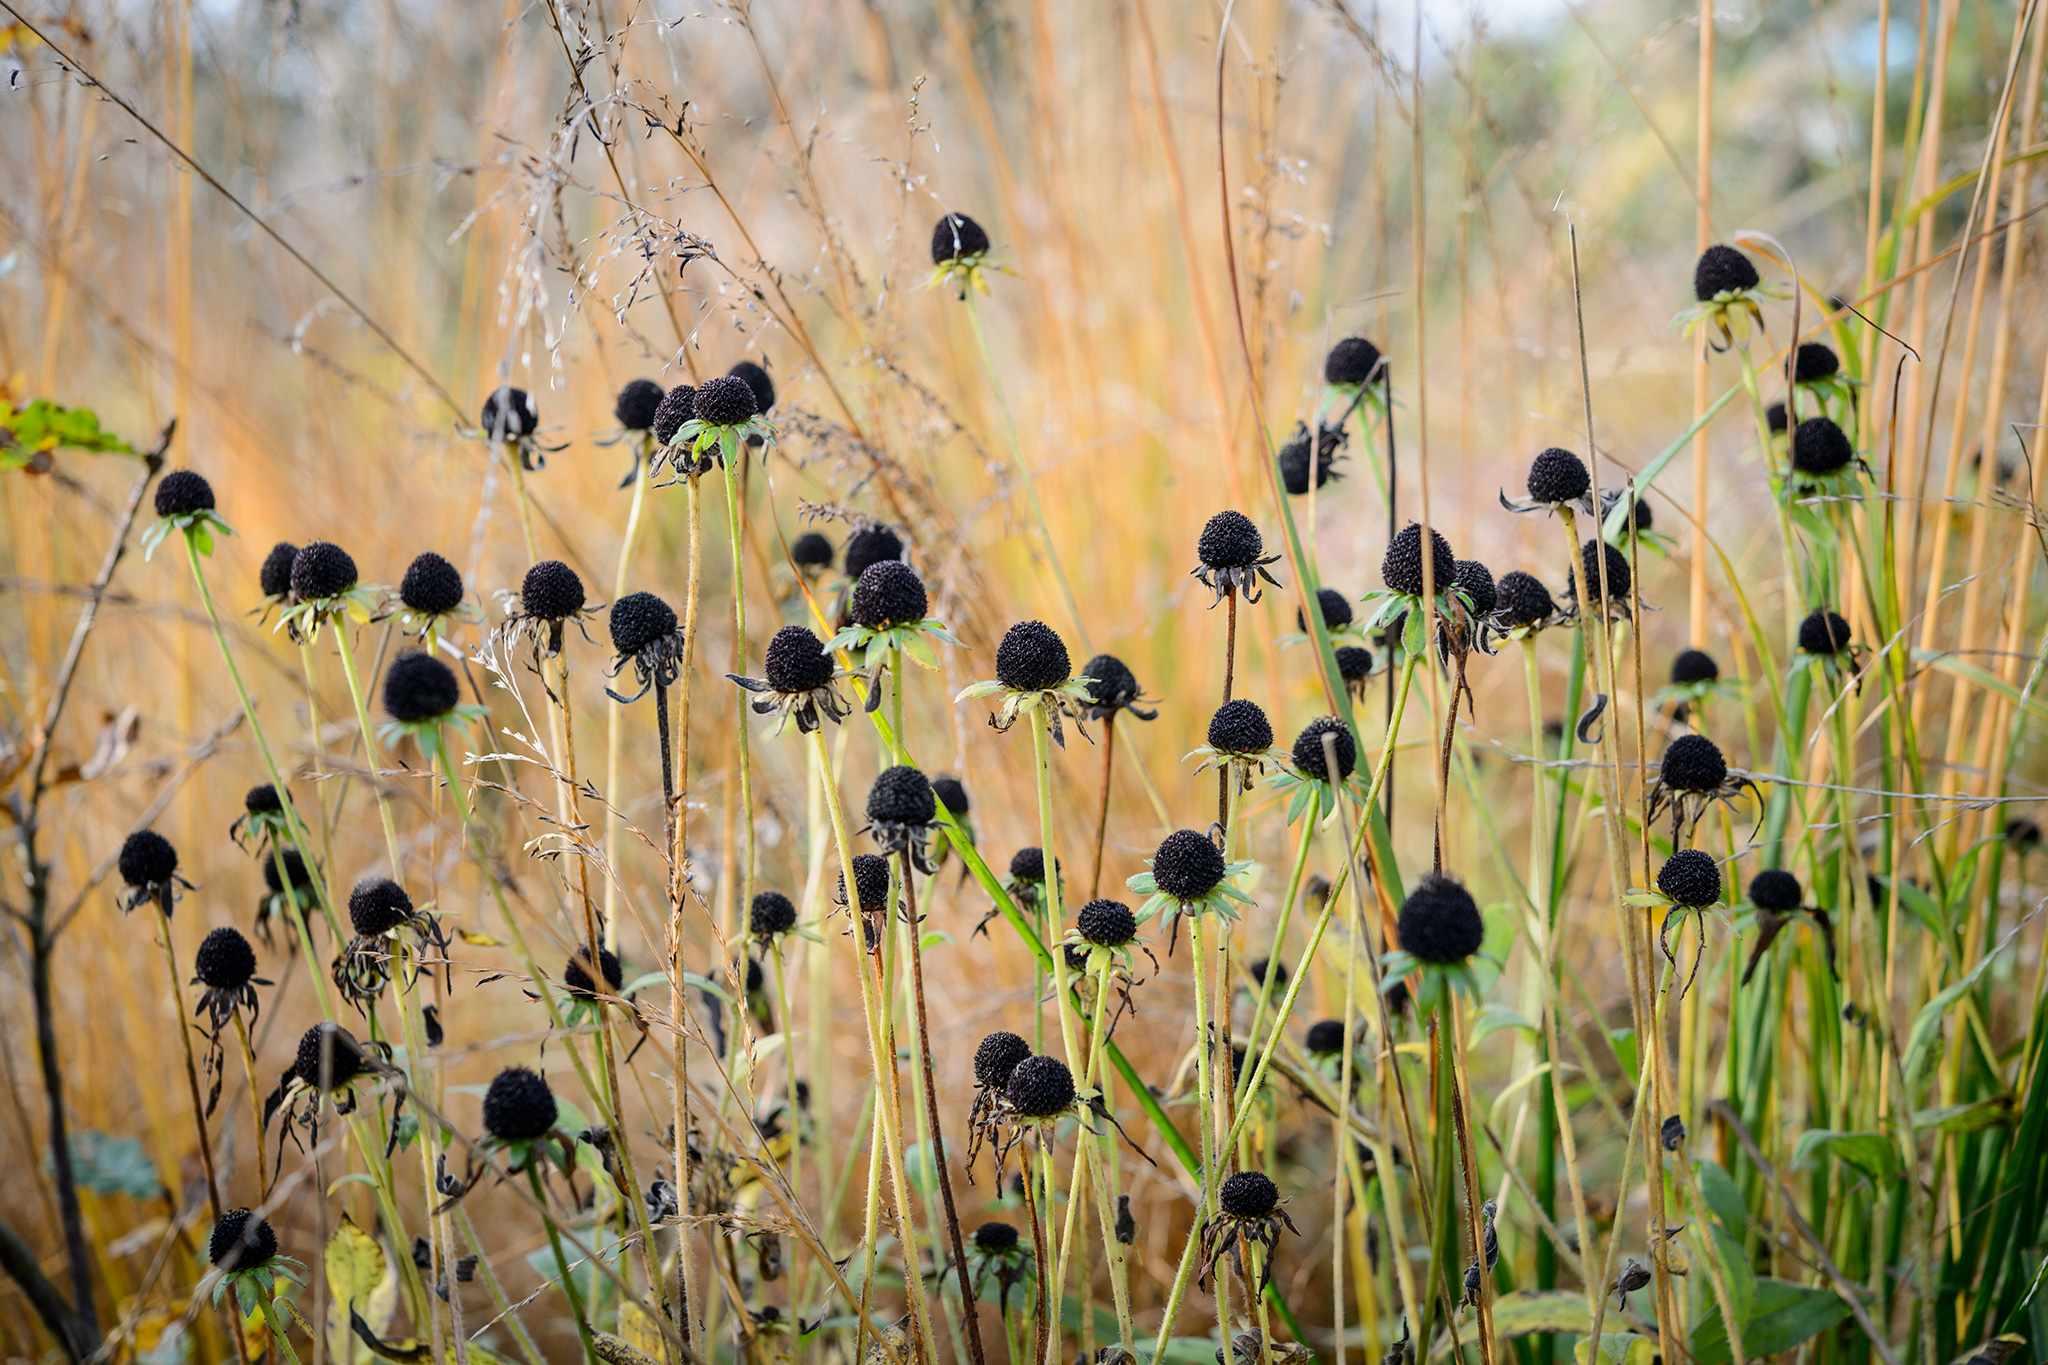 Seedheads of Rudbeckia fulgida